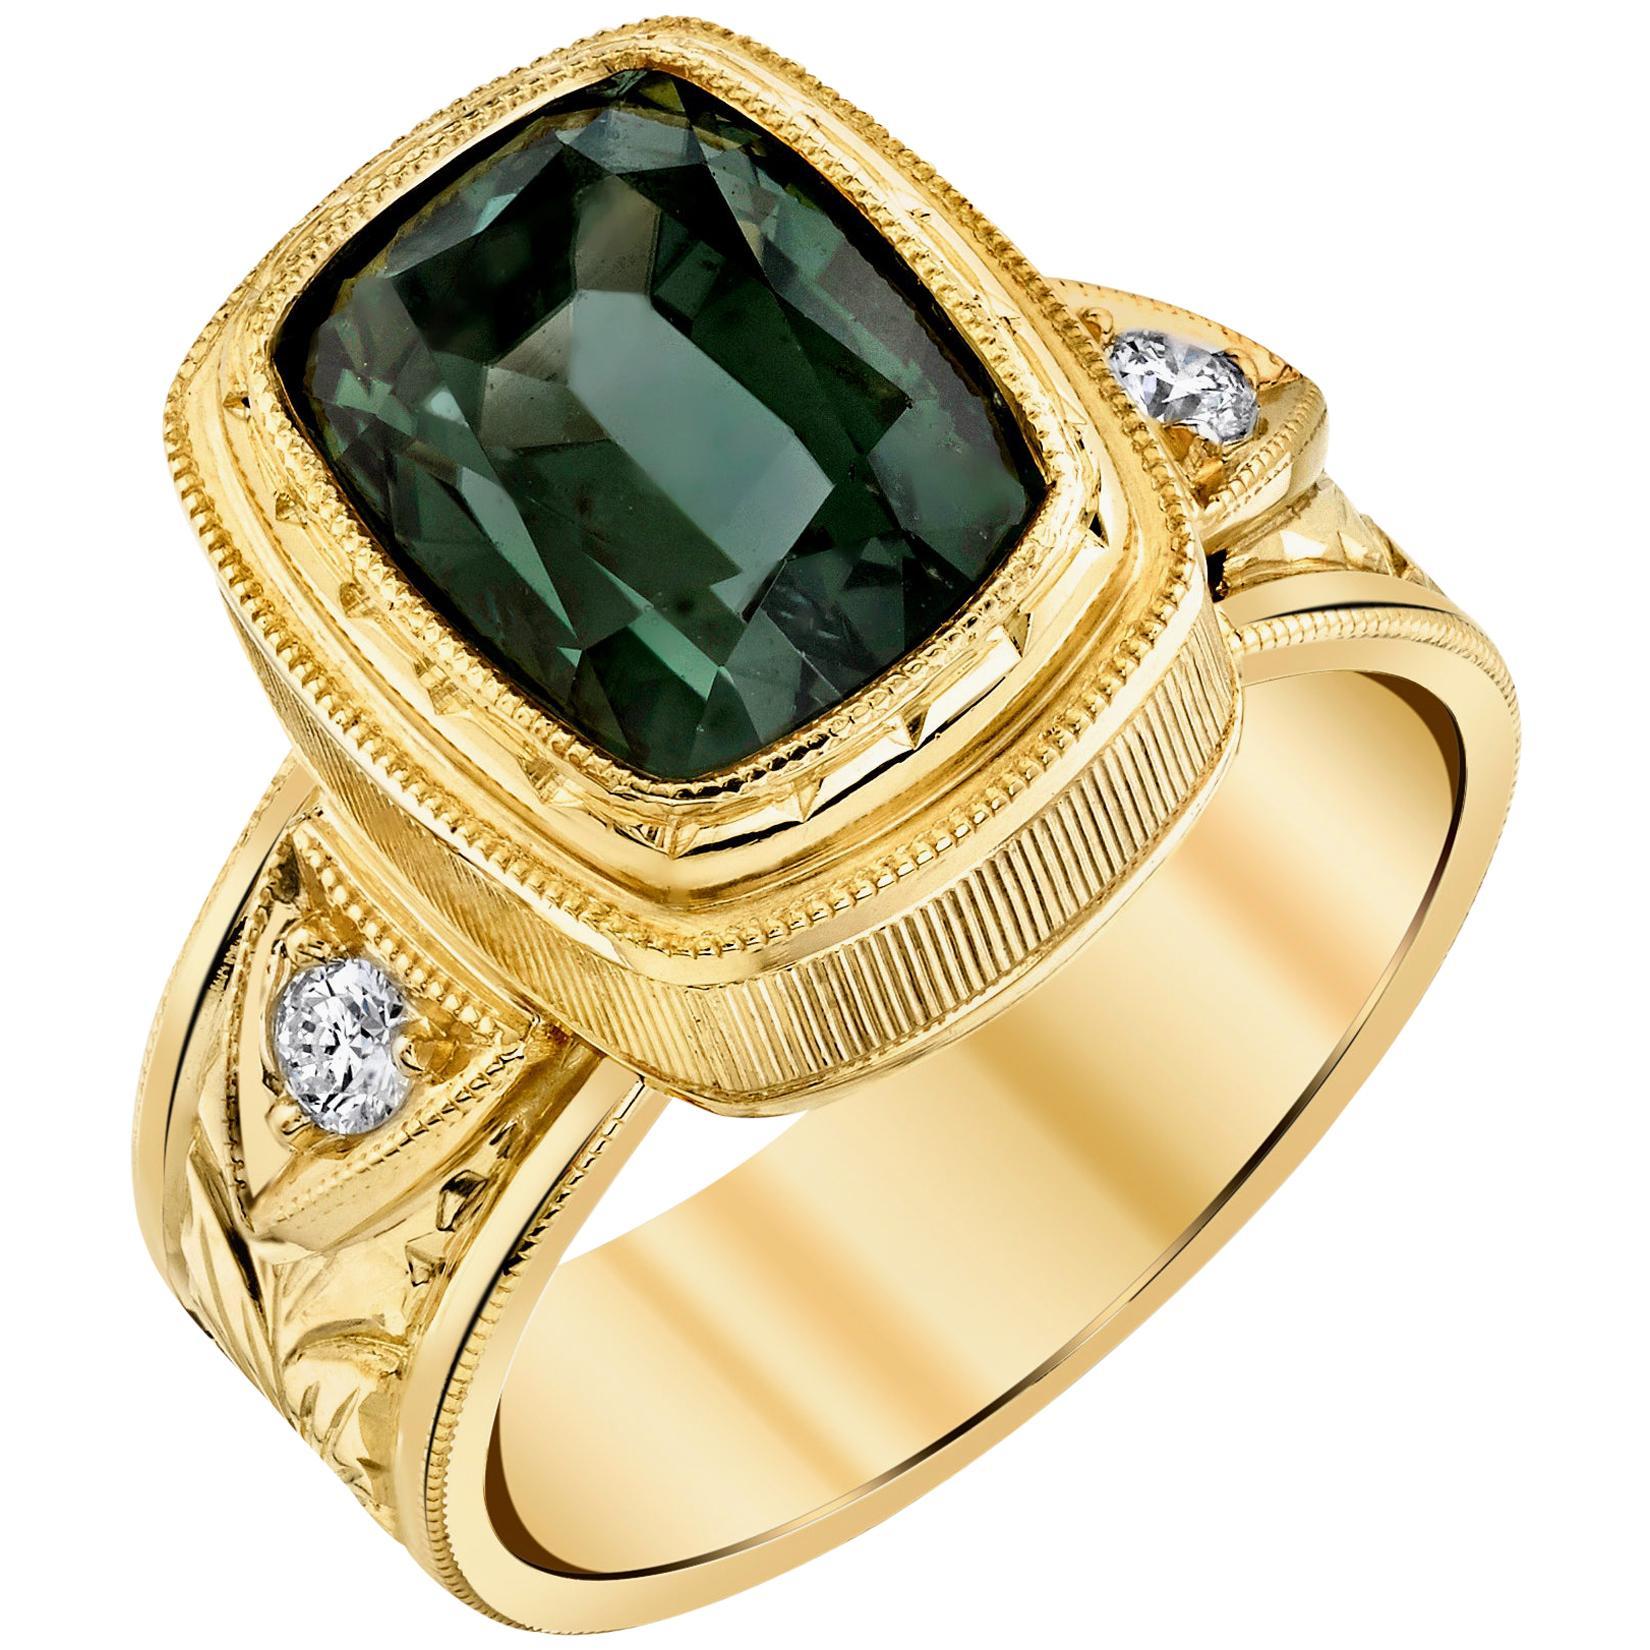 5.49 ct. Green Tourmaline, Diamond, Yellow Gold Bezel Engraved Band Ring